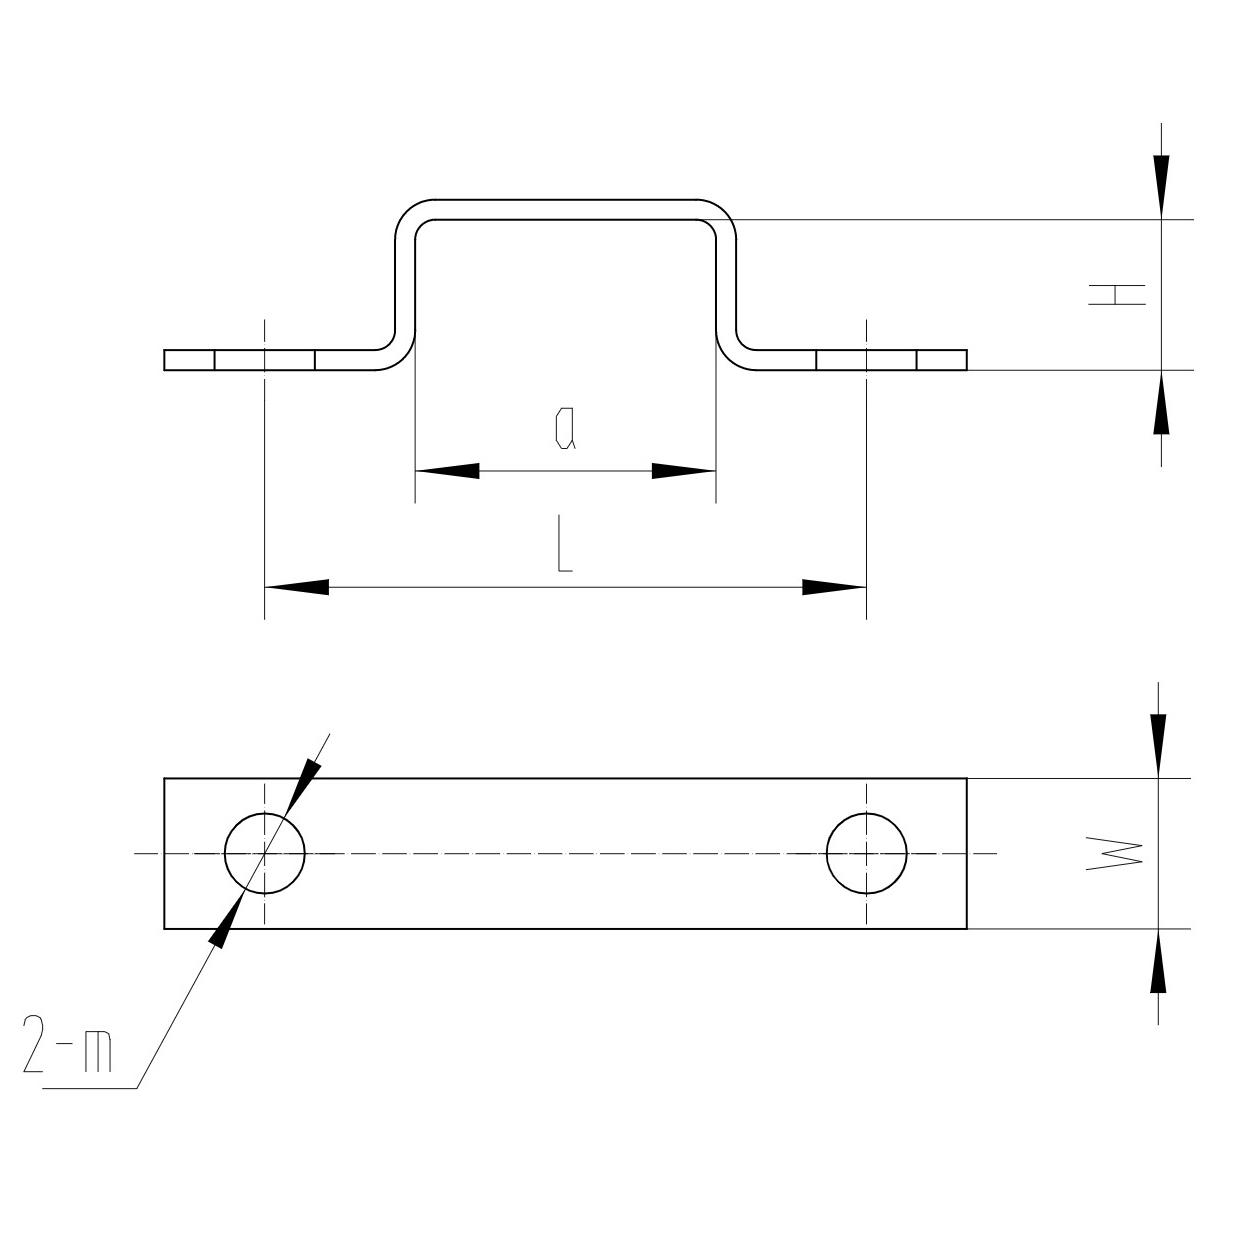 SGH Drawing